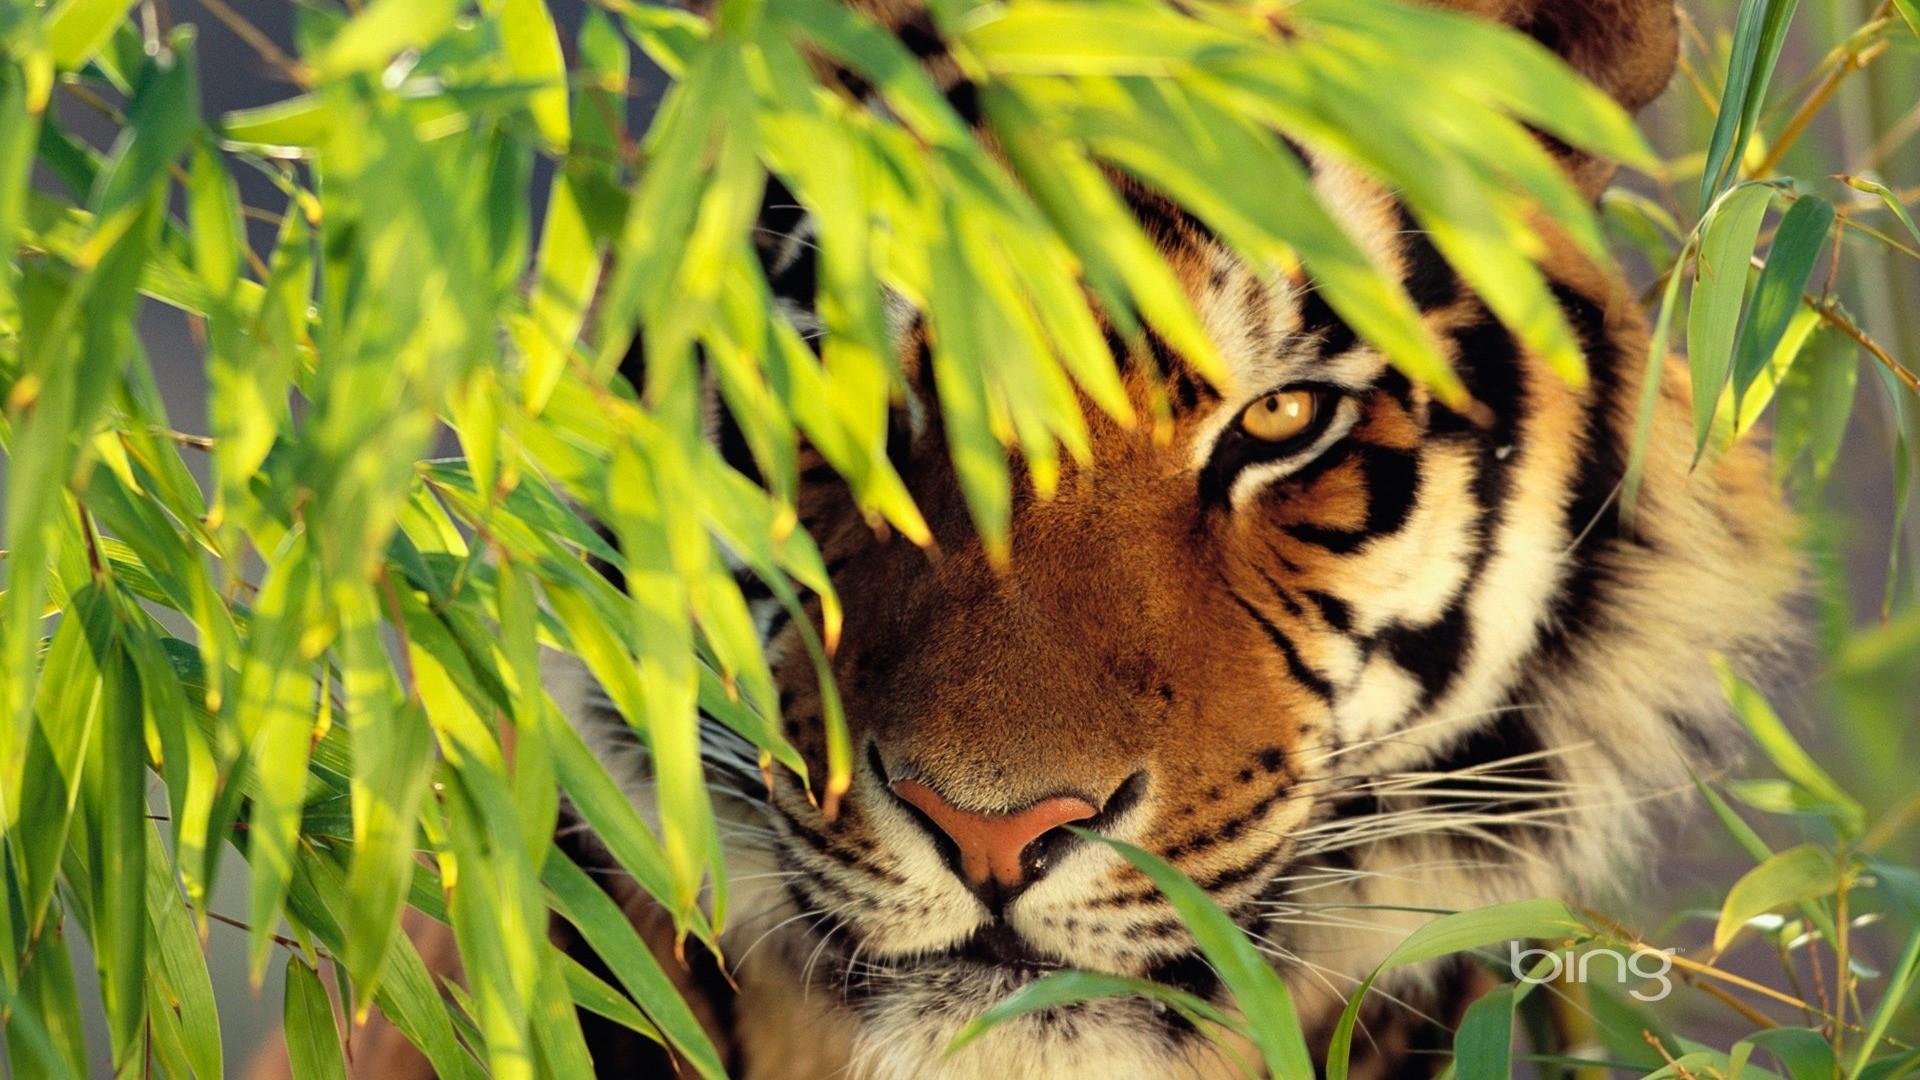 Tiger Wallpaper HD 1080p hd background hd screensavers hd wallpaper .